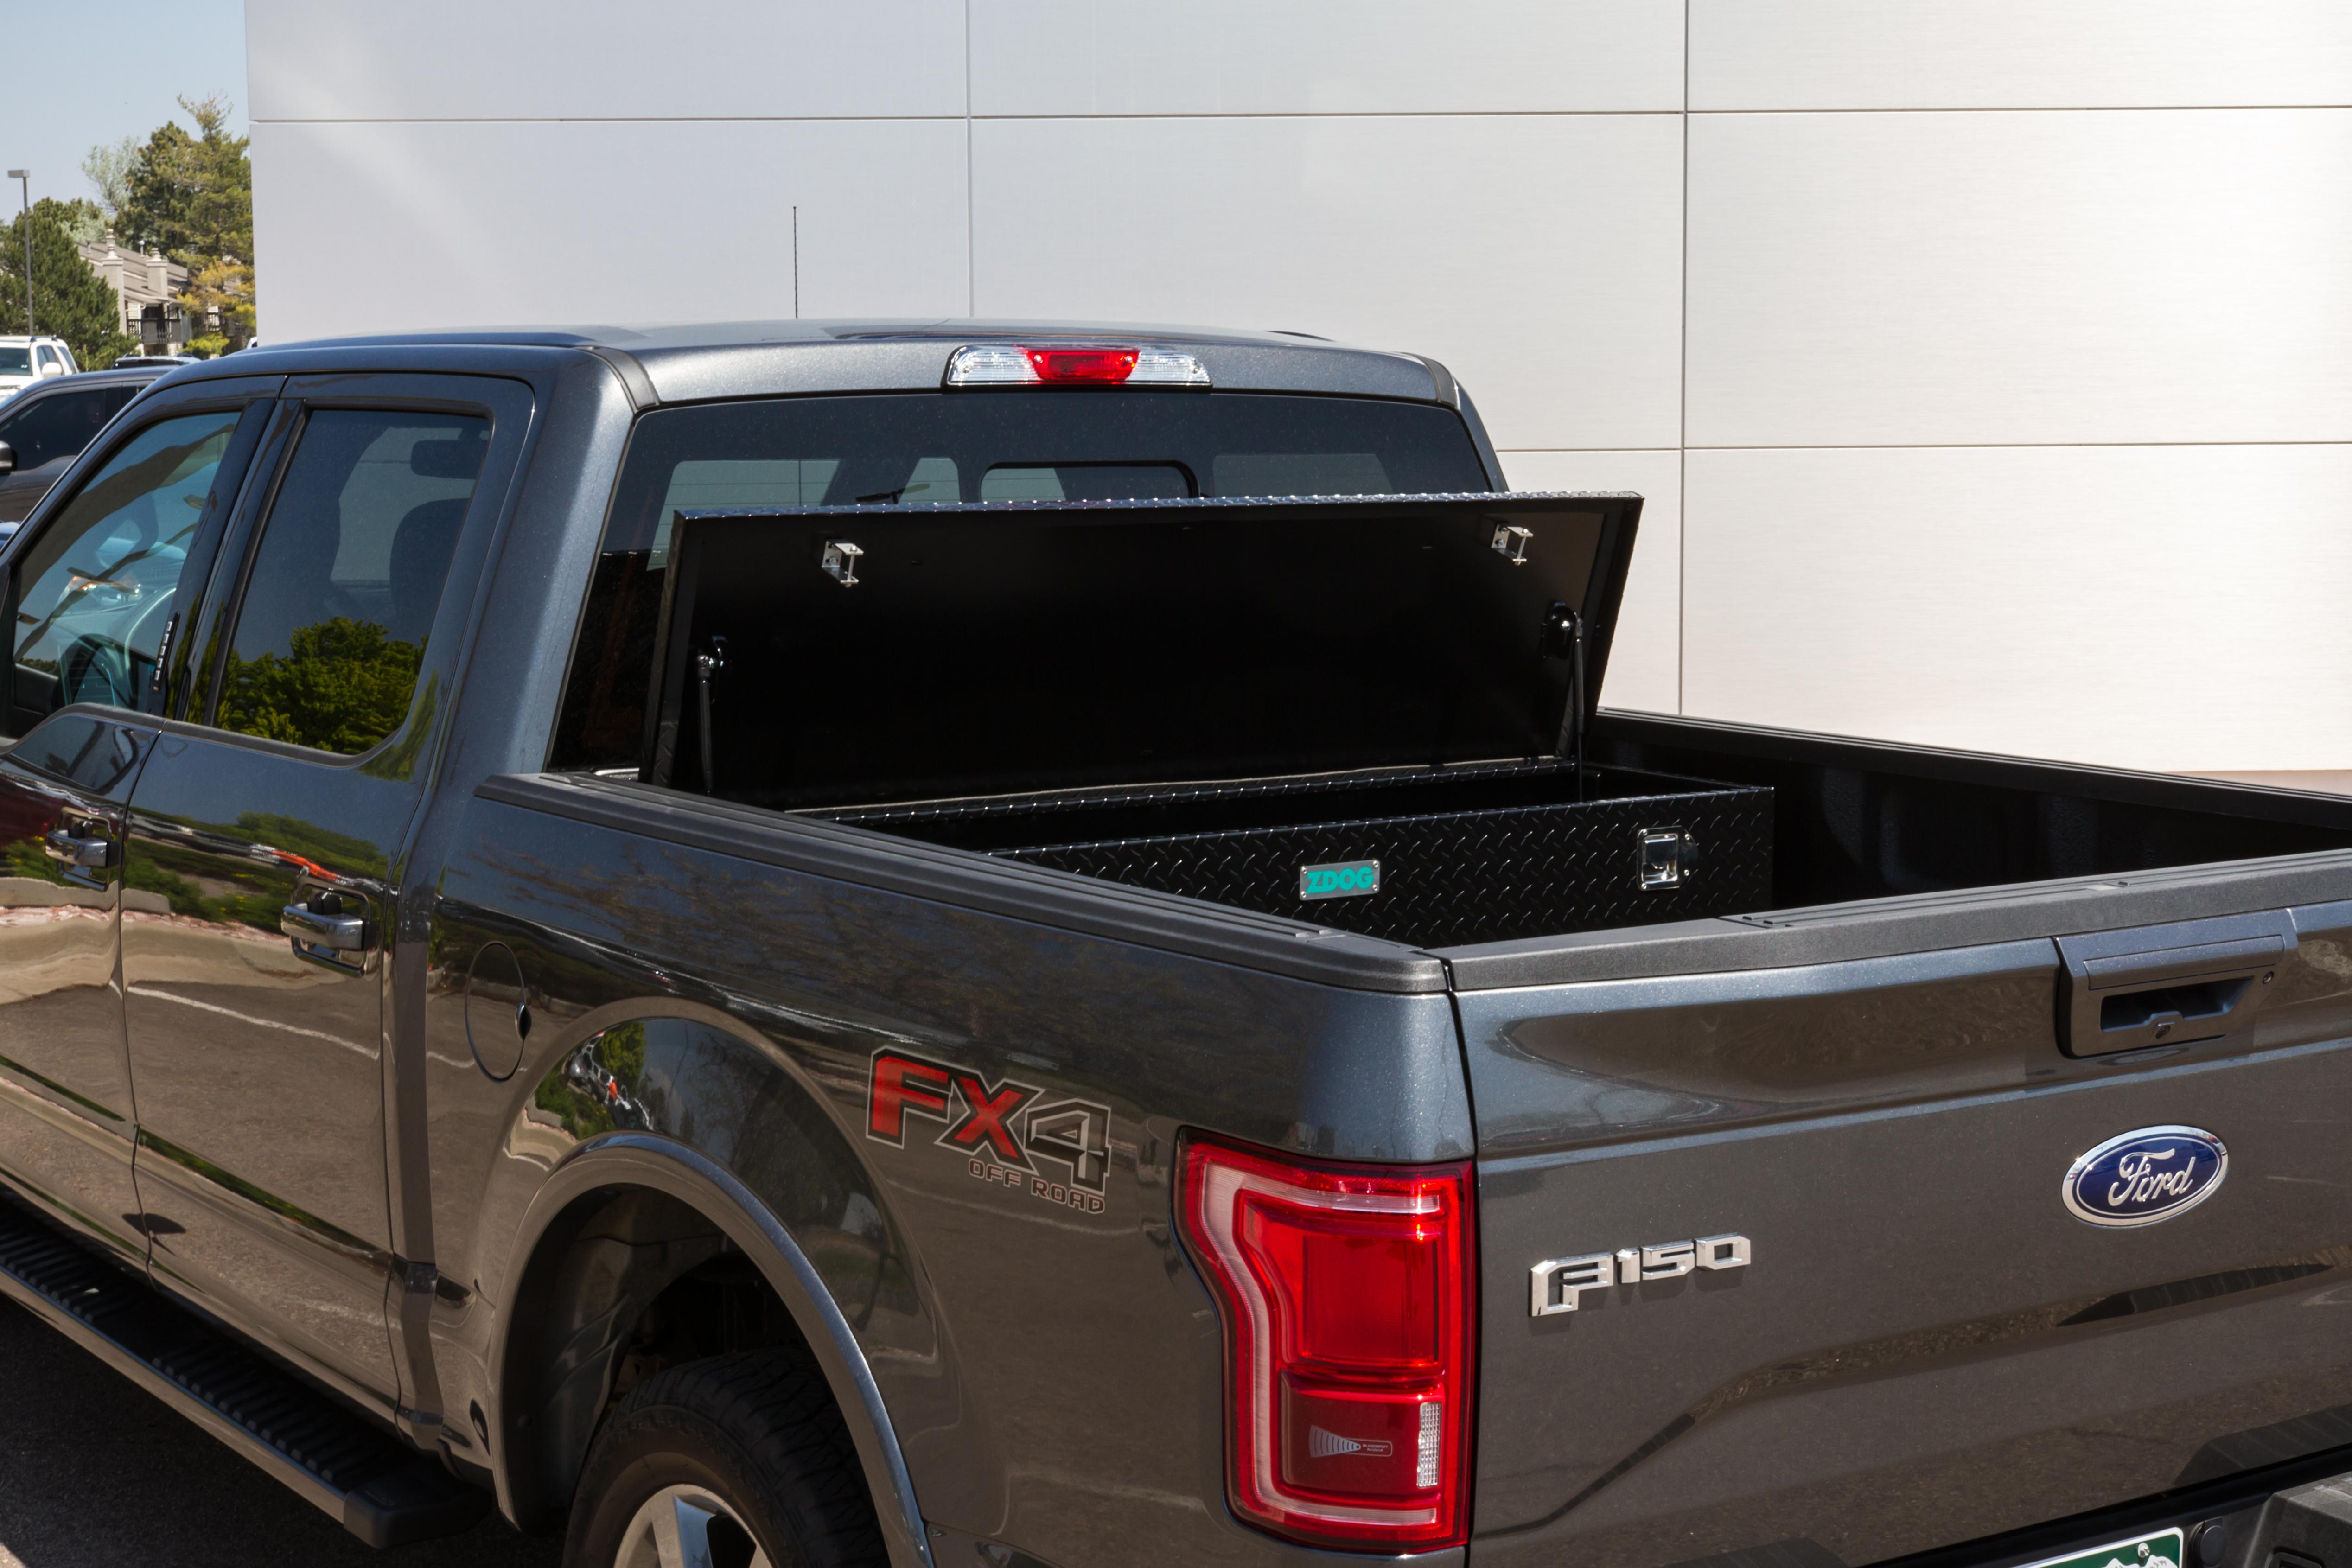 Utility Truck Beds For Sale >> ZDOG FF5-2000 (Ford F-150, 2015 or newer models) | ZDOG ...